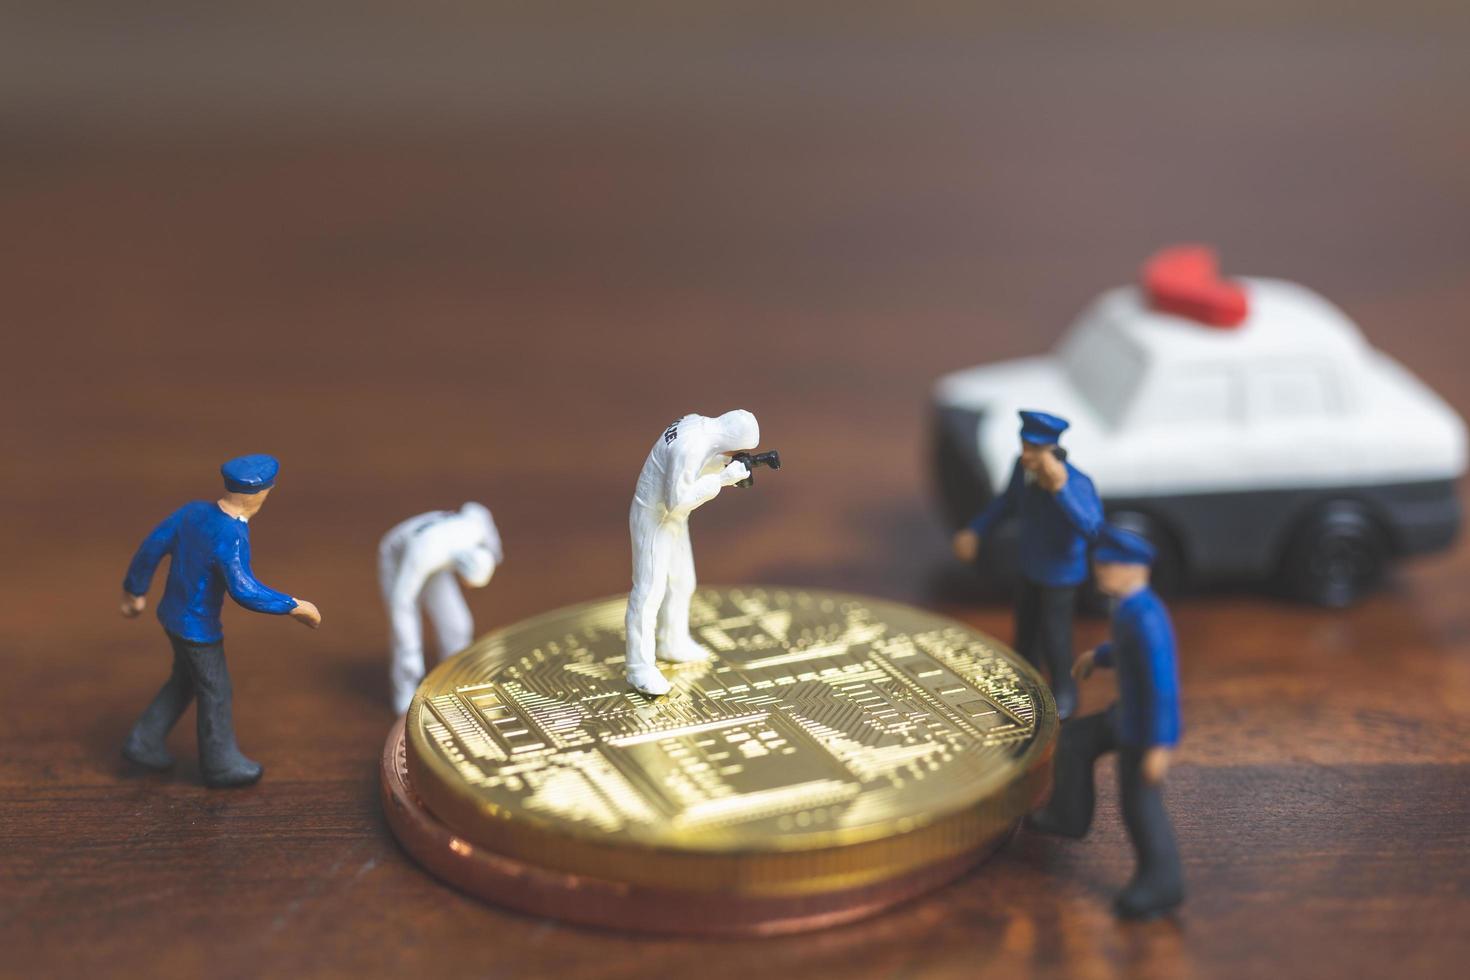 miniatyrpolis och detektiver som står framför bitcoin-kryptokurrency, cyberbrottskoncept foto